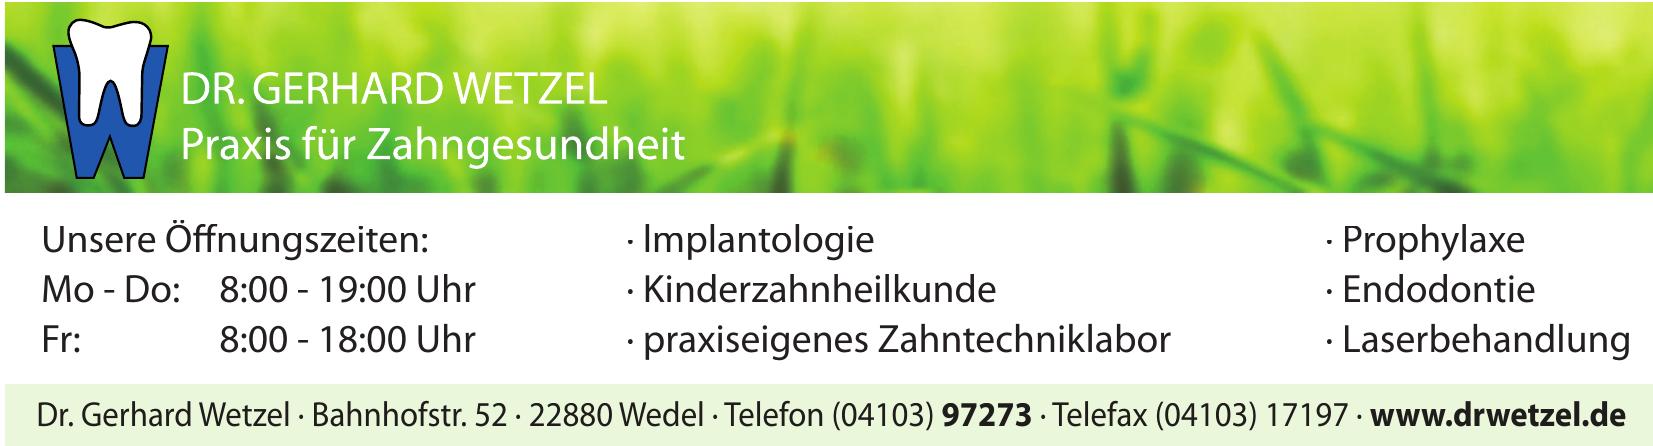 Dr. Gerhard Wetzel